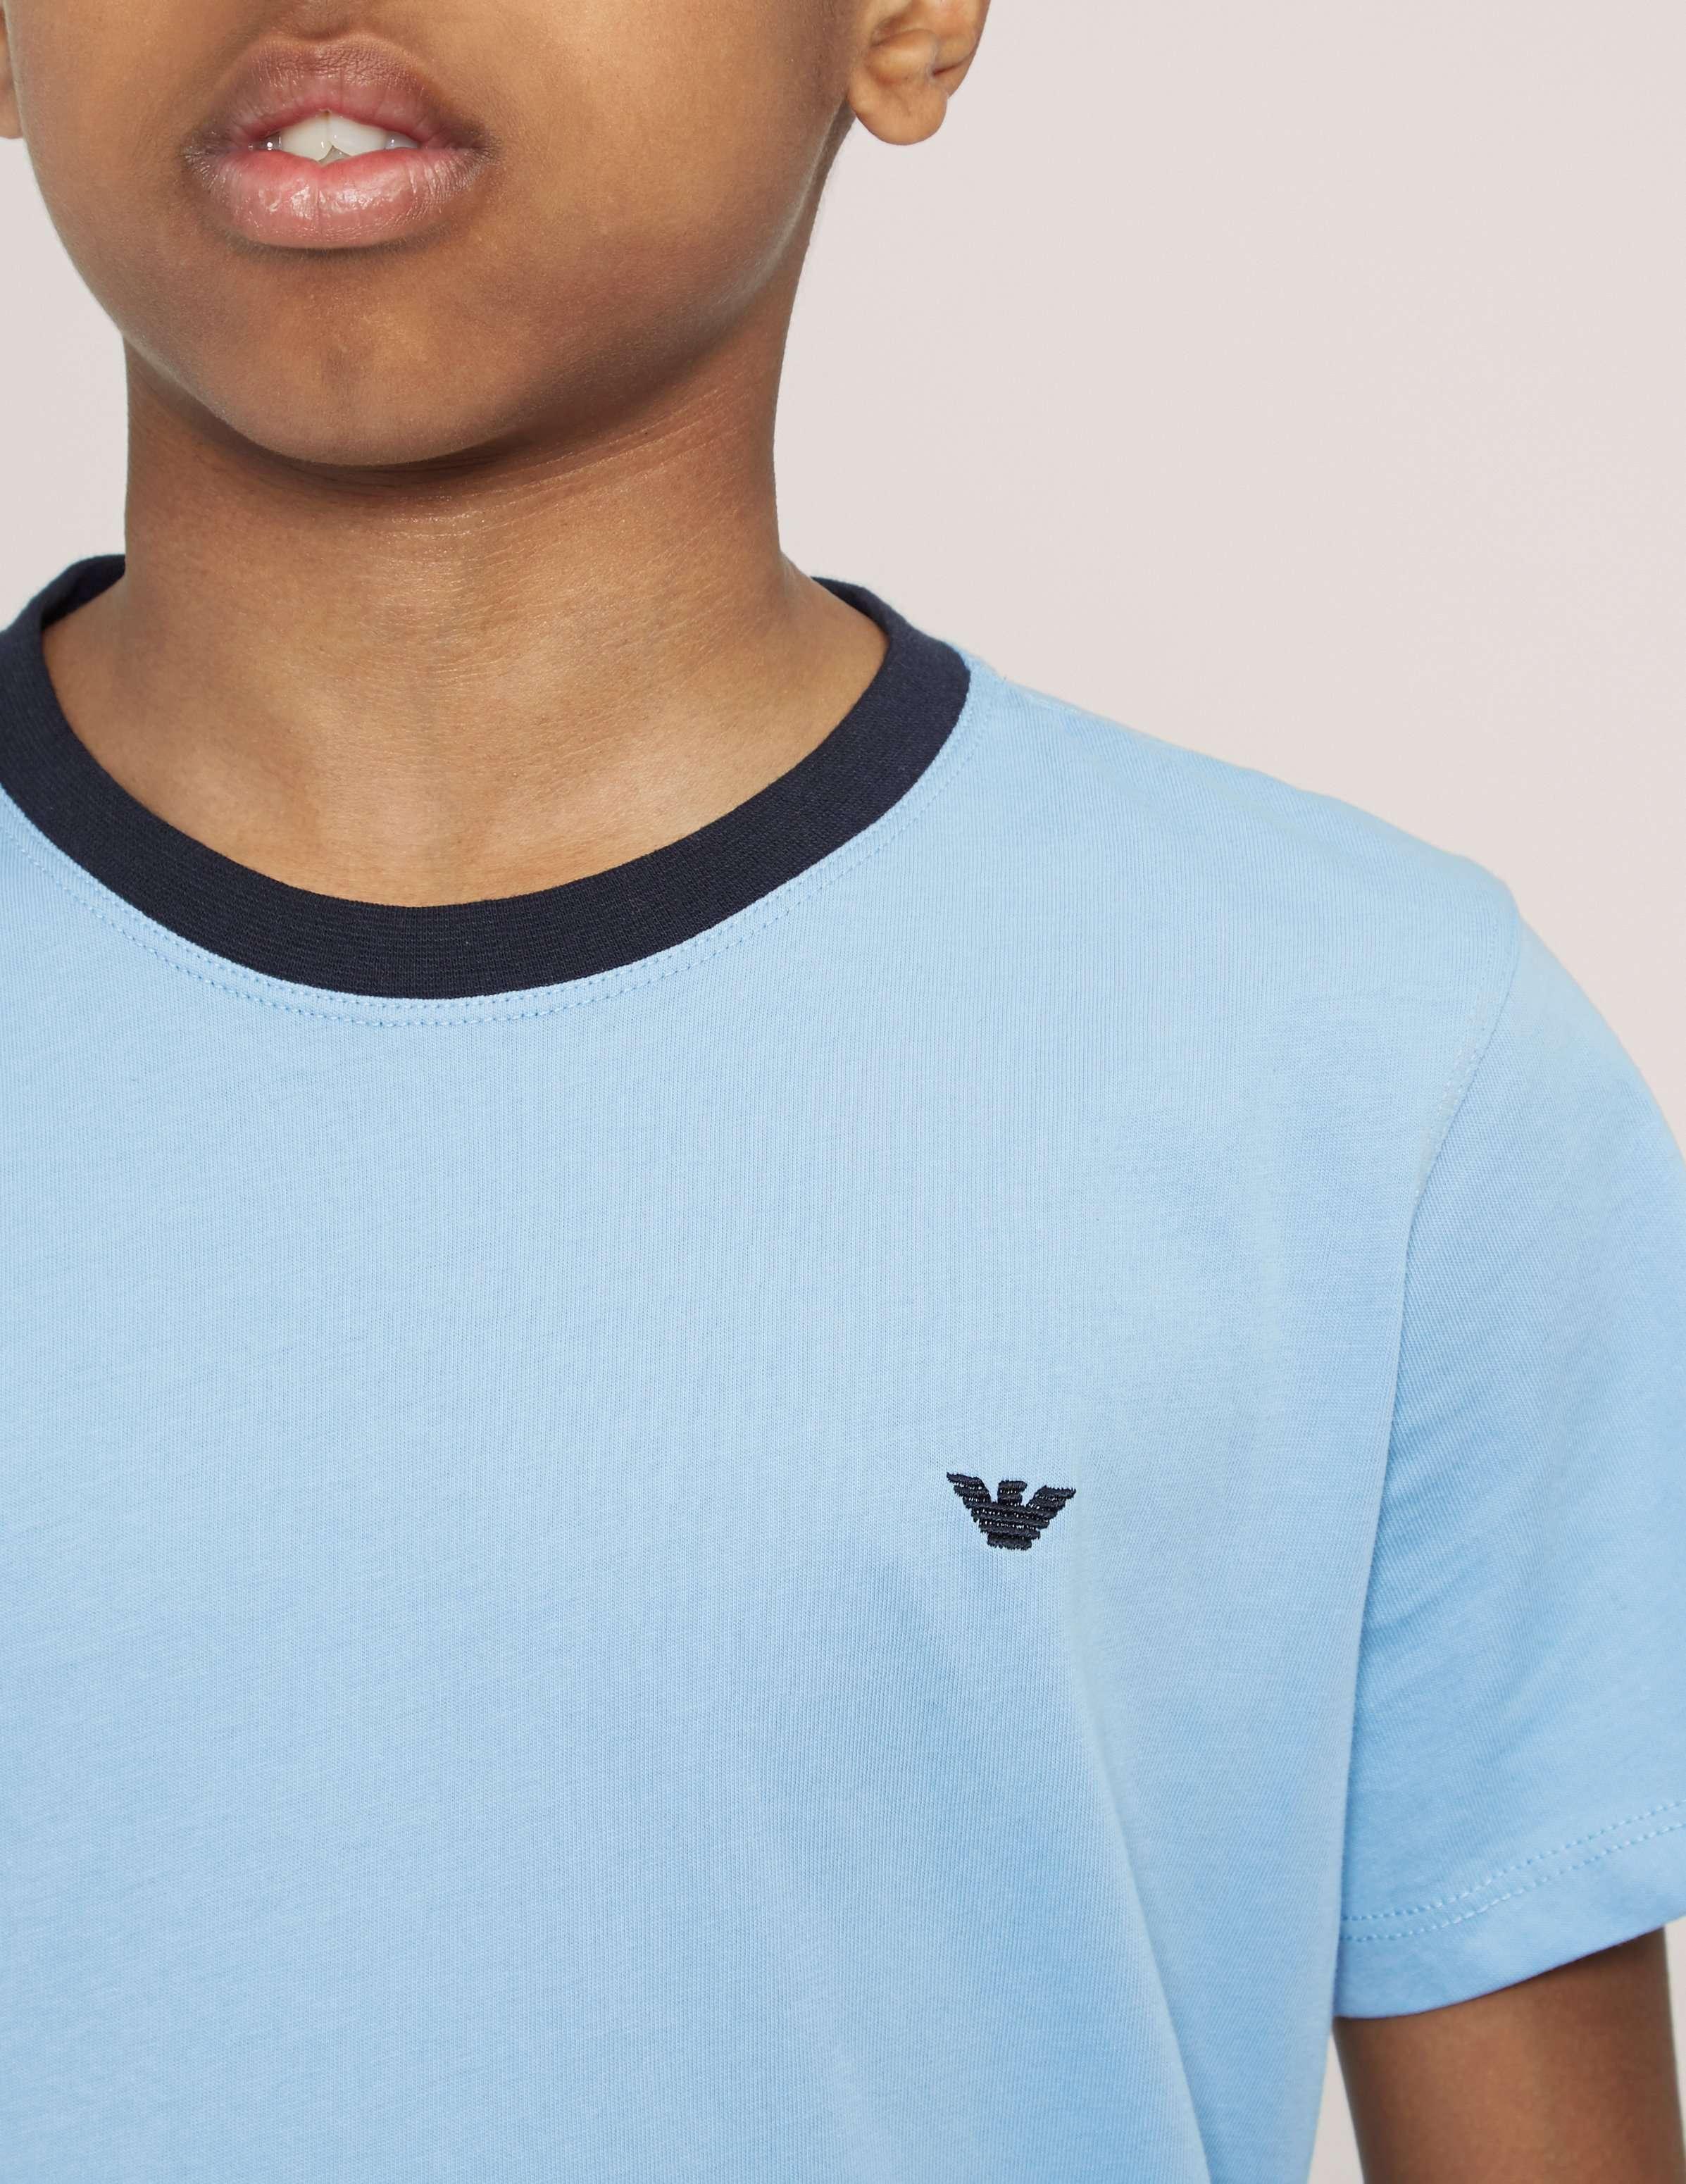 Armani Jeans Crew Short Sleeve T-Shirt